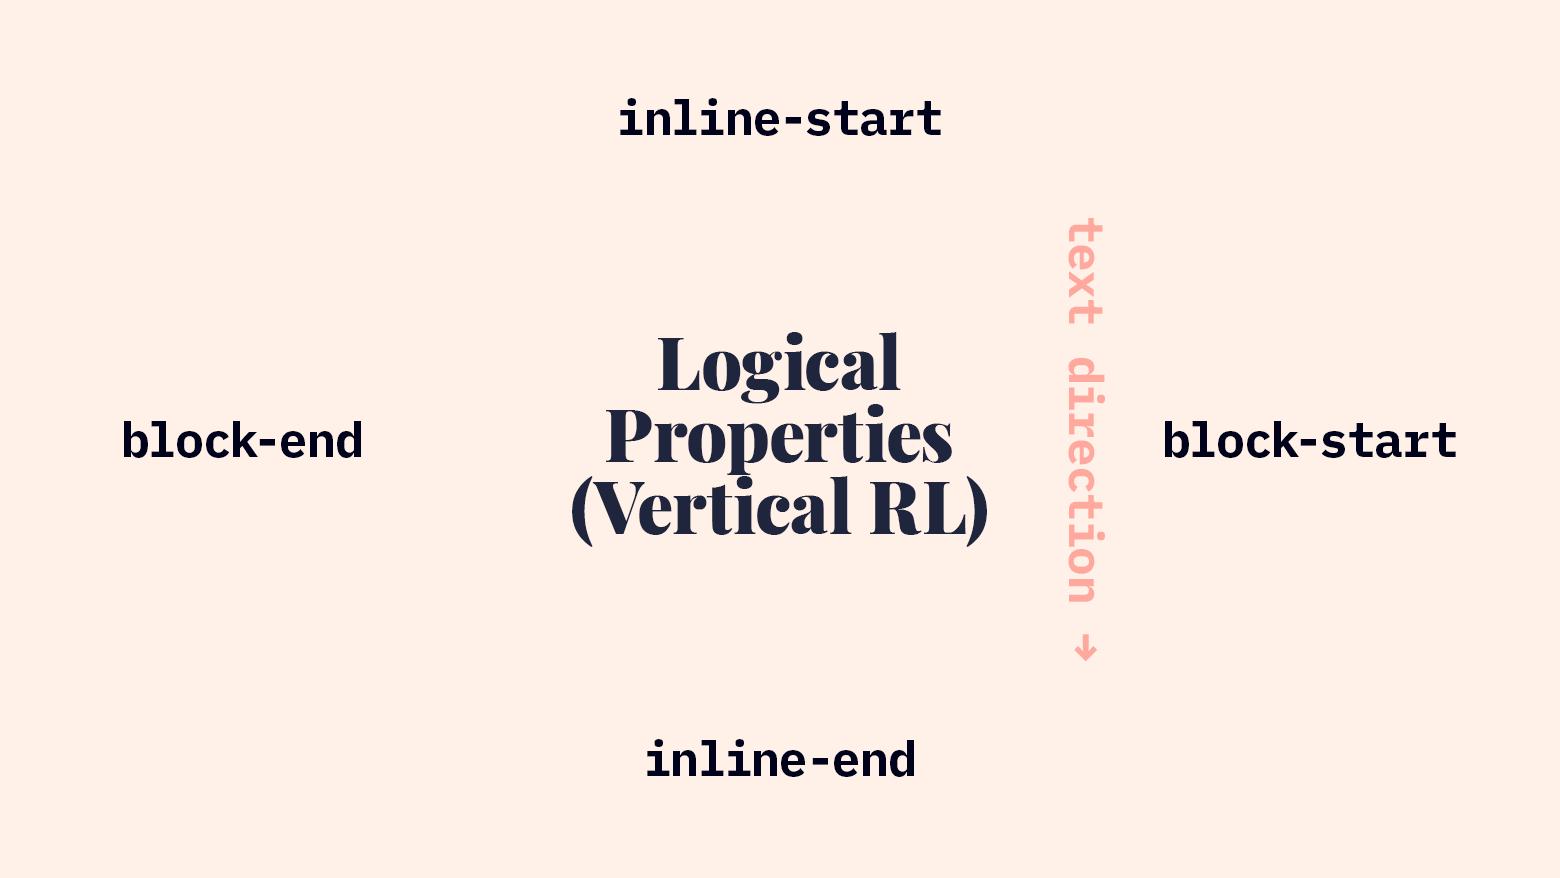 Logical Properties in Vertical RL Writing Mode